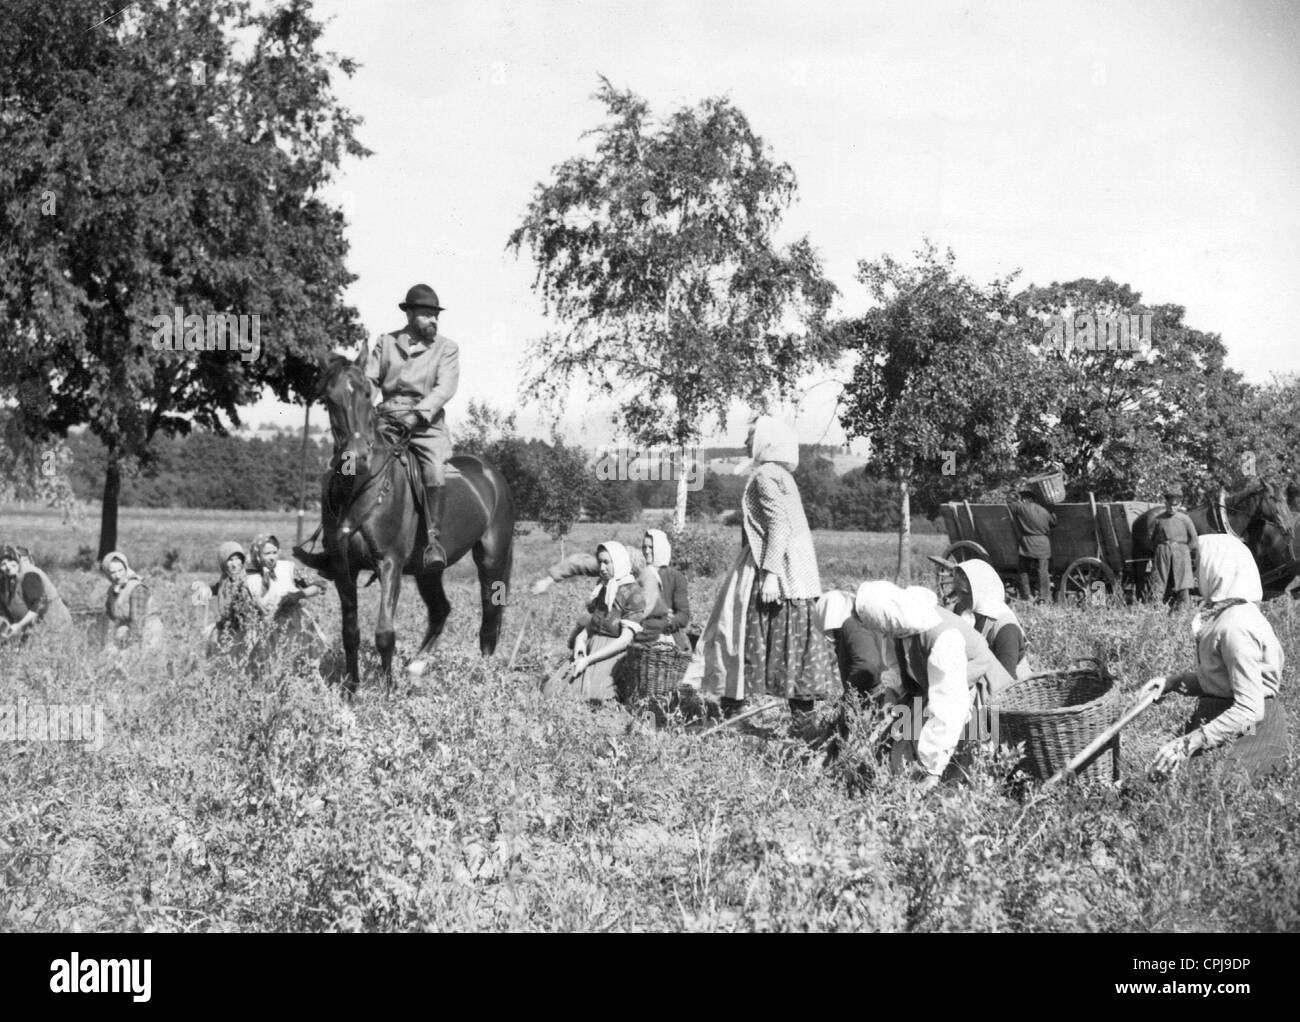 Squire and farmhands in 'The Kreutzer Sonata', 1937 - Stock Image